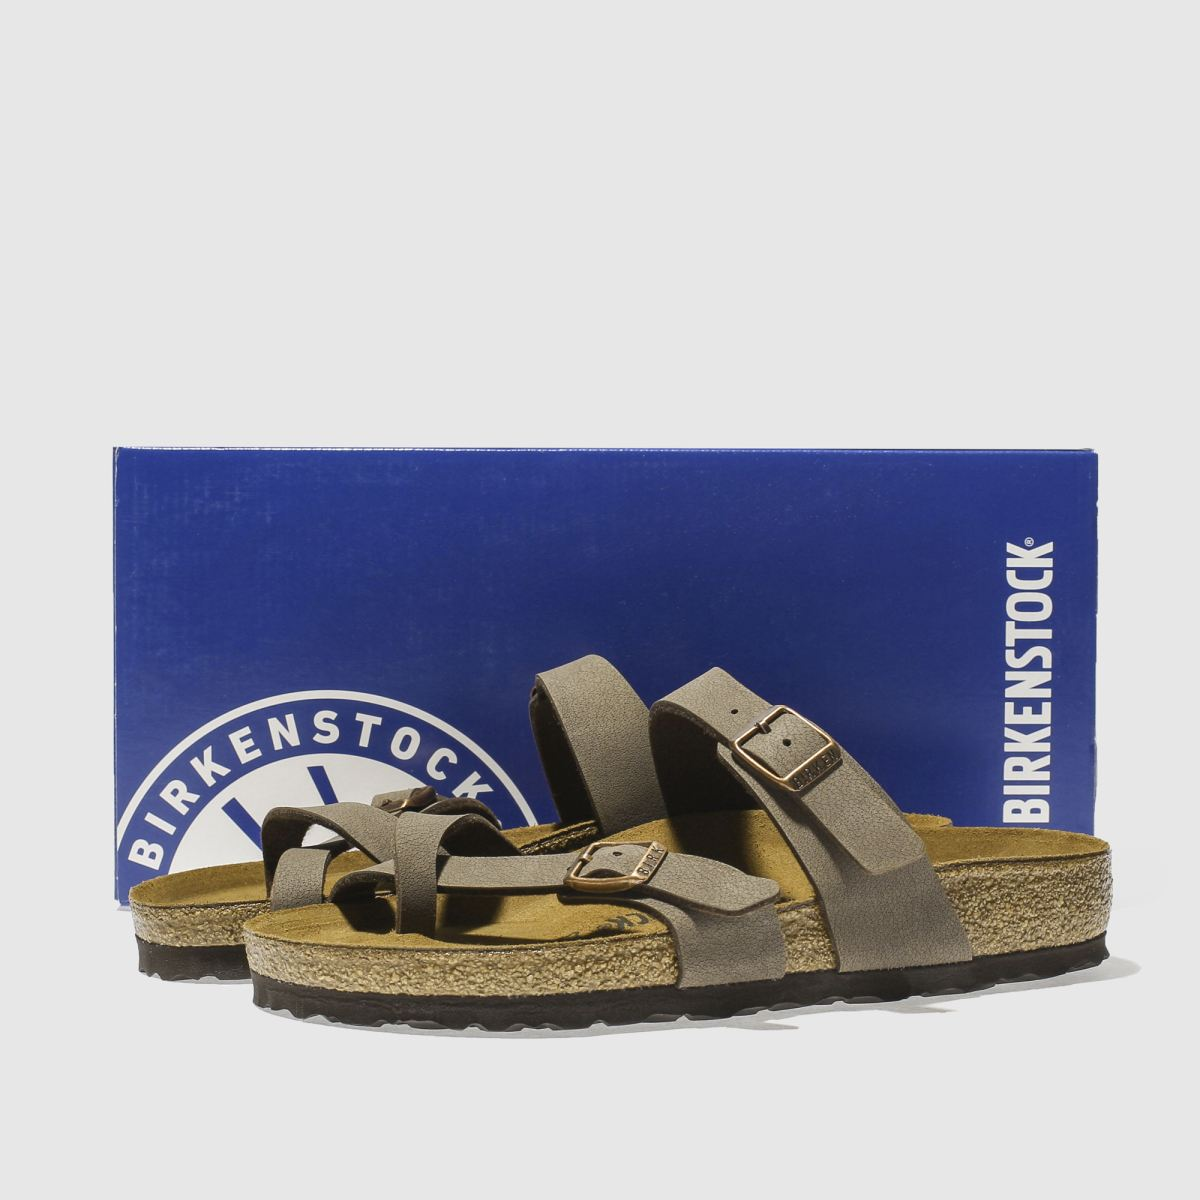 Damen Braun birkenstock Mayari beliebte Sandalen | schuh Gute Qualität beliebte Mayari Schuhe 810828